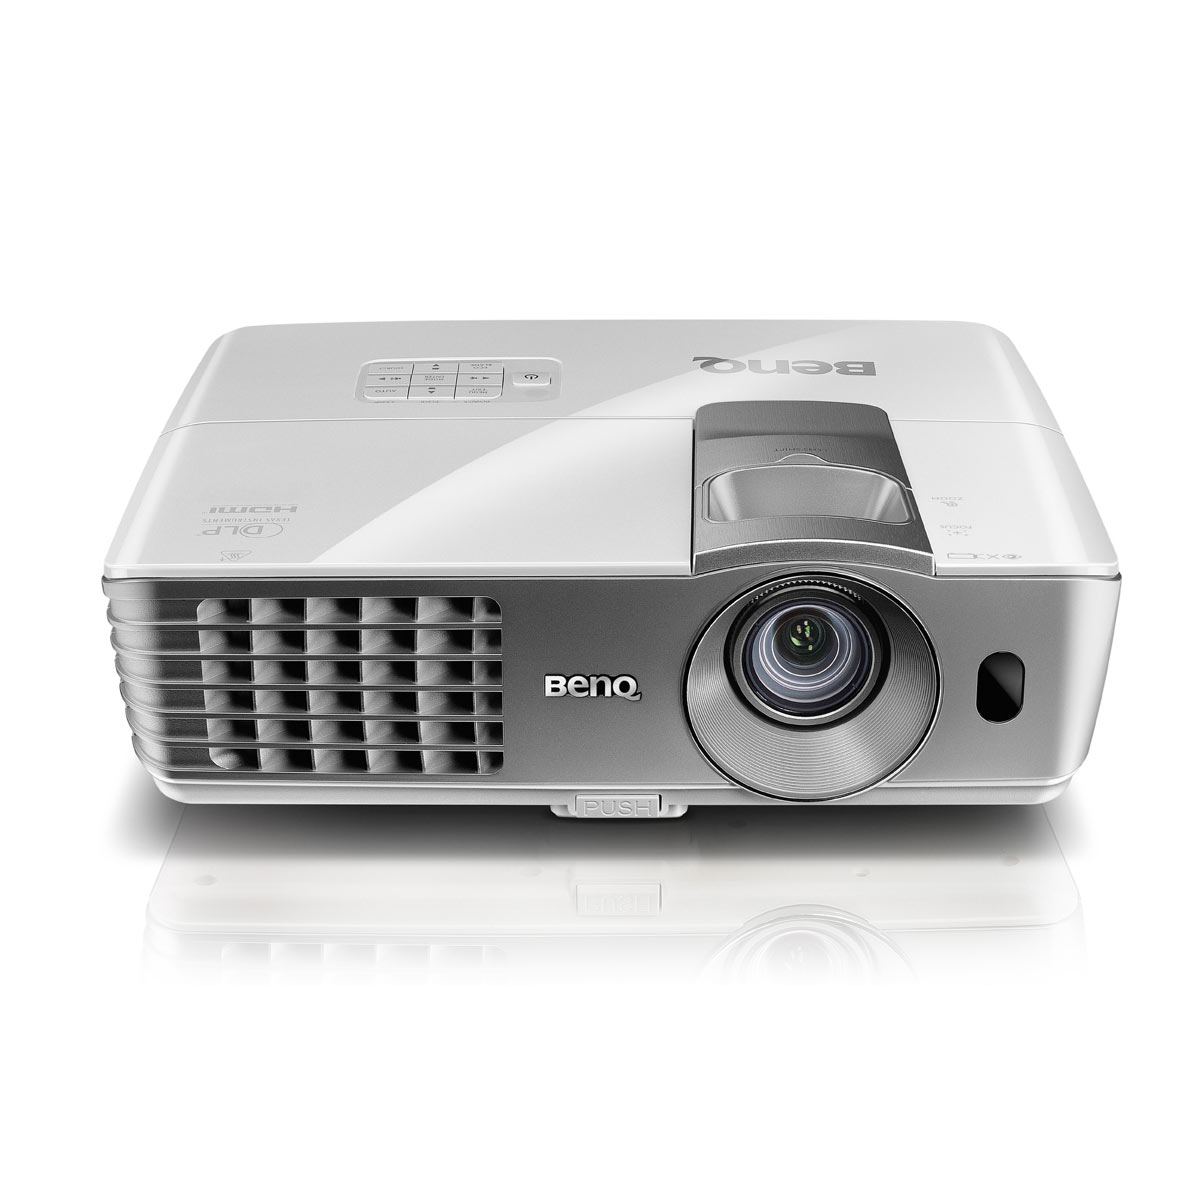 Vidéoprojecteur BenQ W1070 Vidéoprojecteur DLP Full HD 3D Ready 1080p 2000 Lumens - Lens Shift